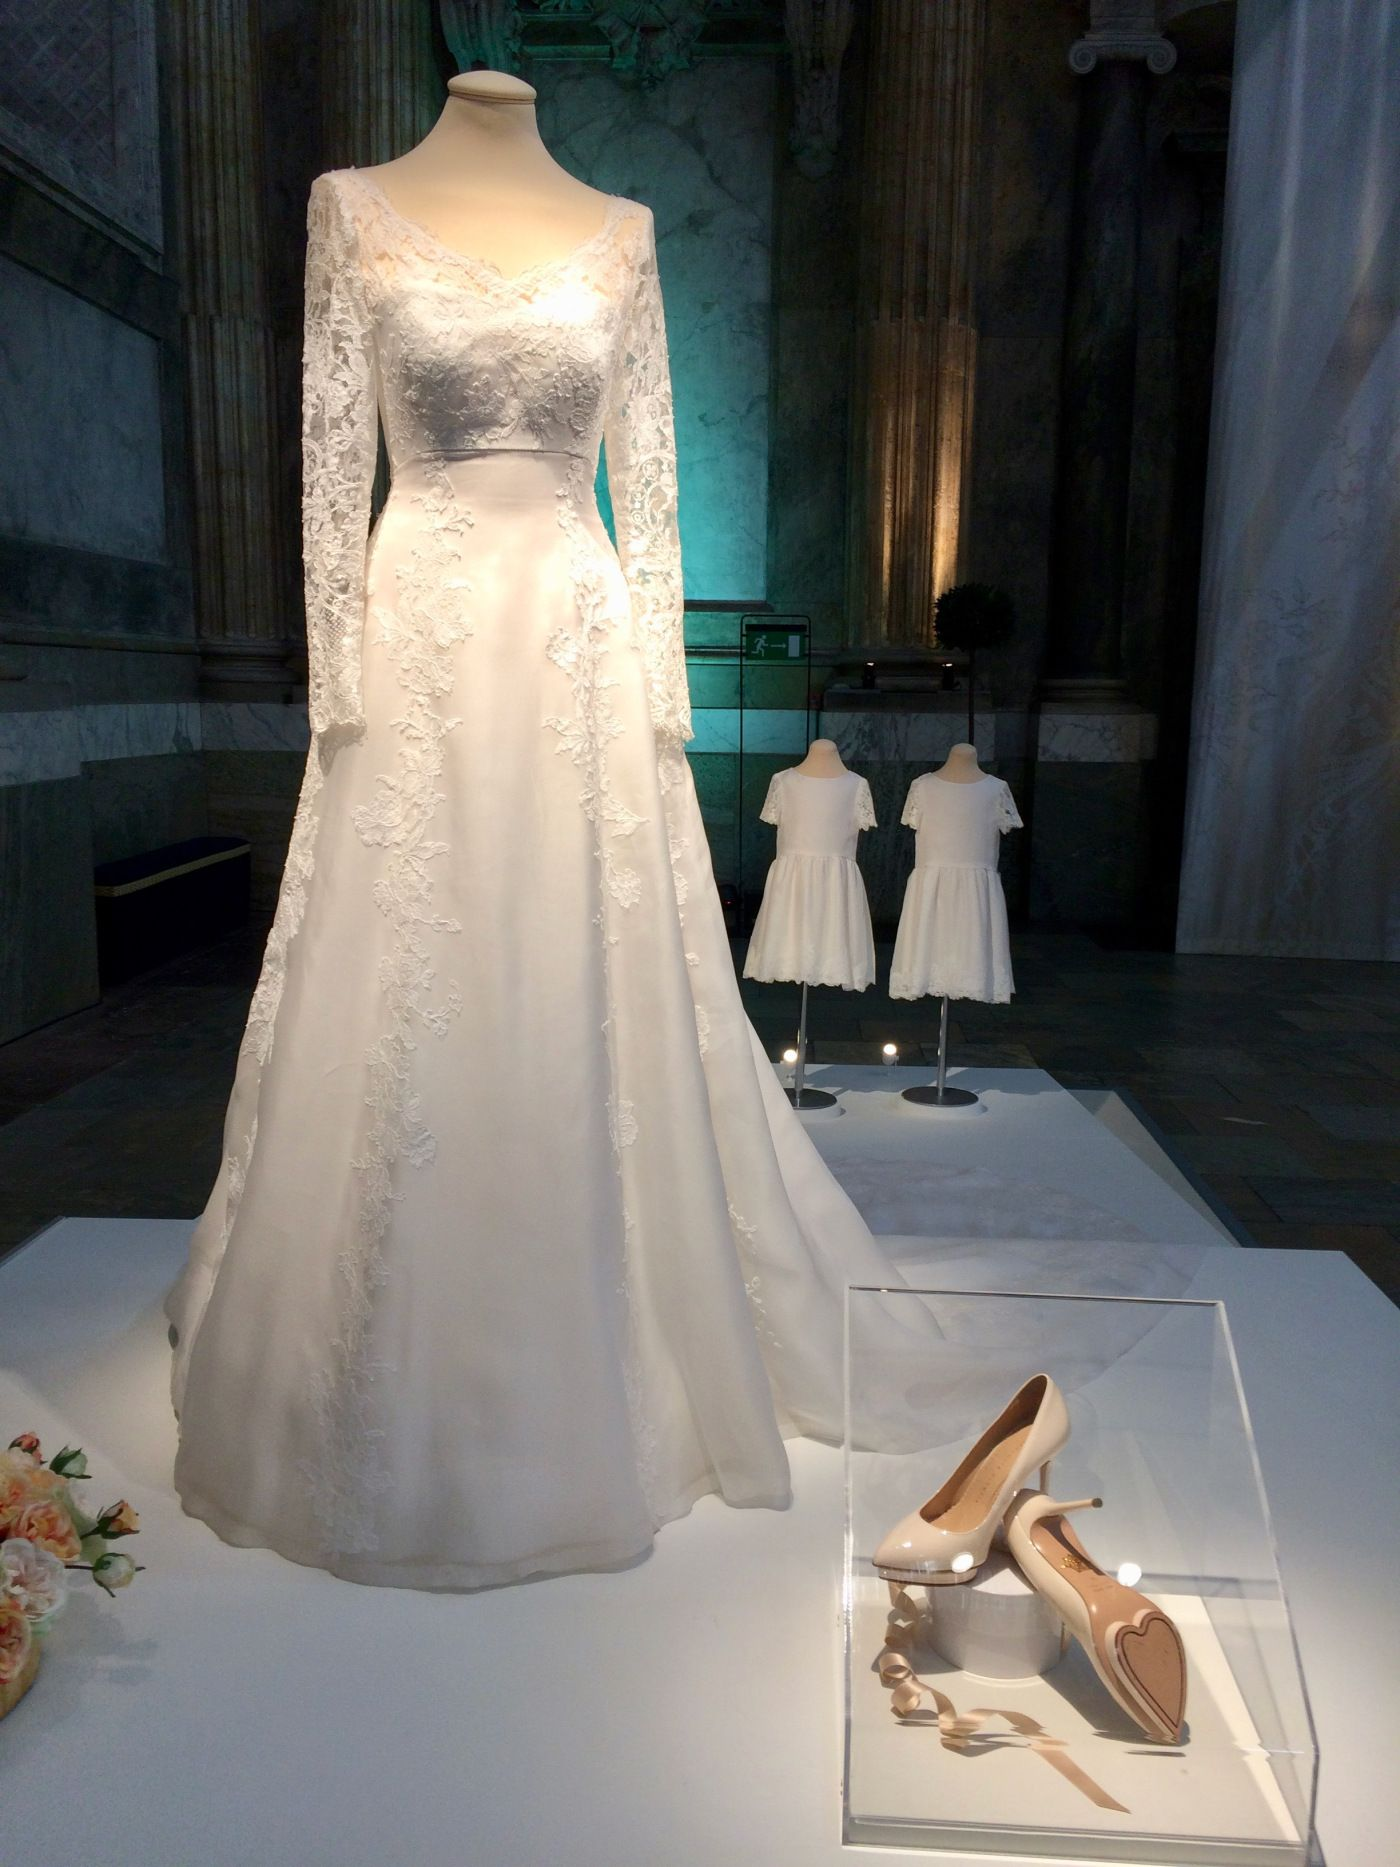 Swedish Royal Wedding Dress Exhibition Janet Carr Royal Wedding Dress Famous Wedding Dresses Wedding Dresses [ 1867 x 1400 Pixel ]